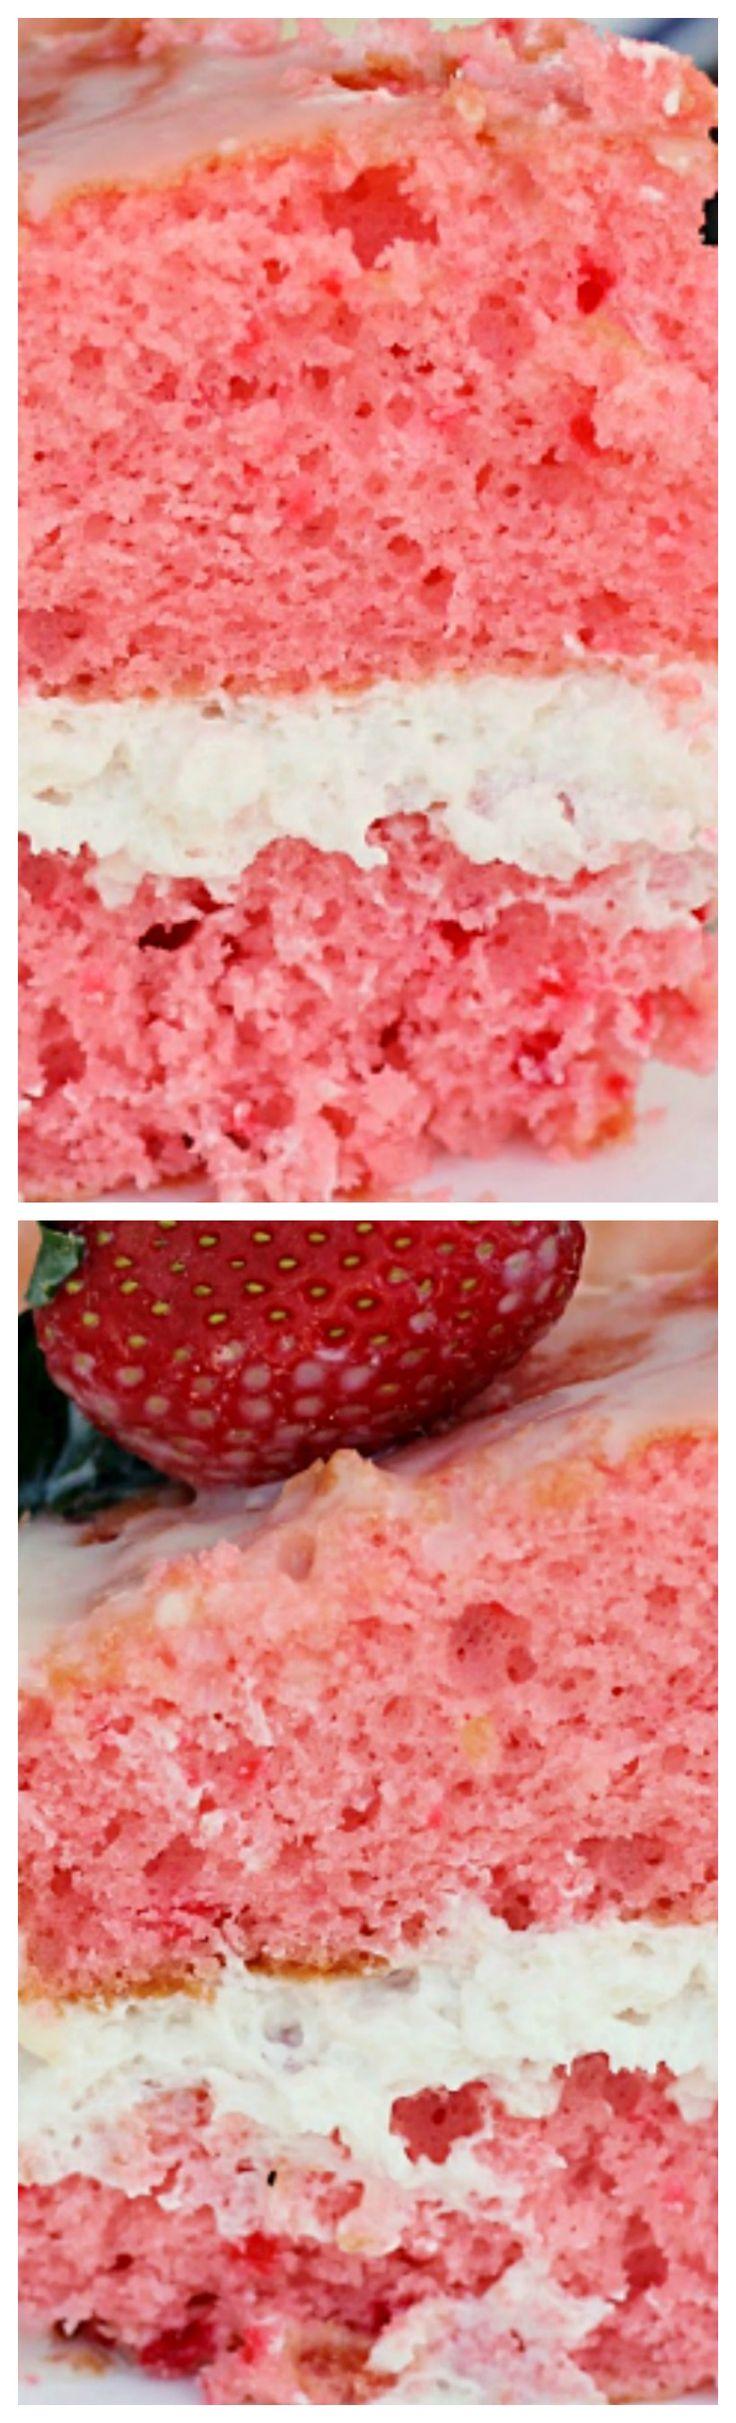 Best 20+ White chocolate strawberries ideas on Pinterest   White ...